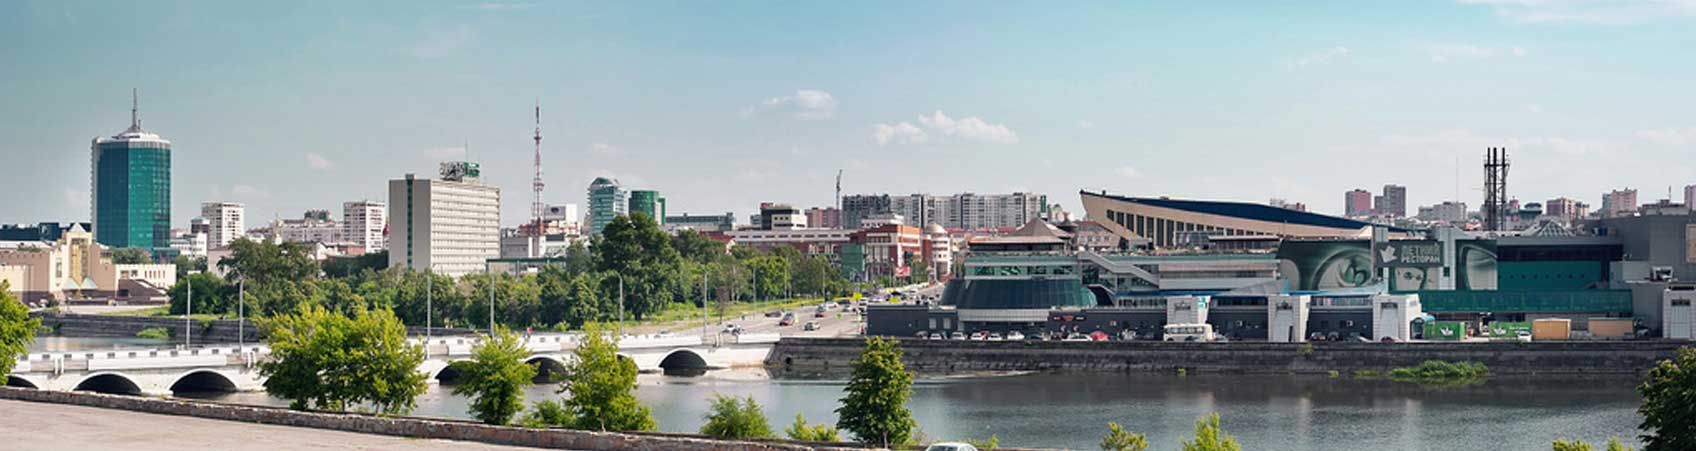 Челябинск - Панорама